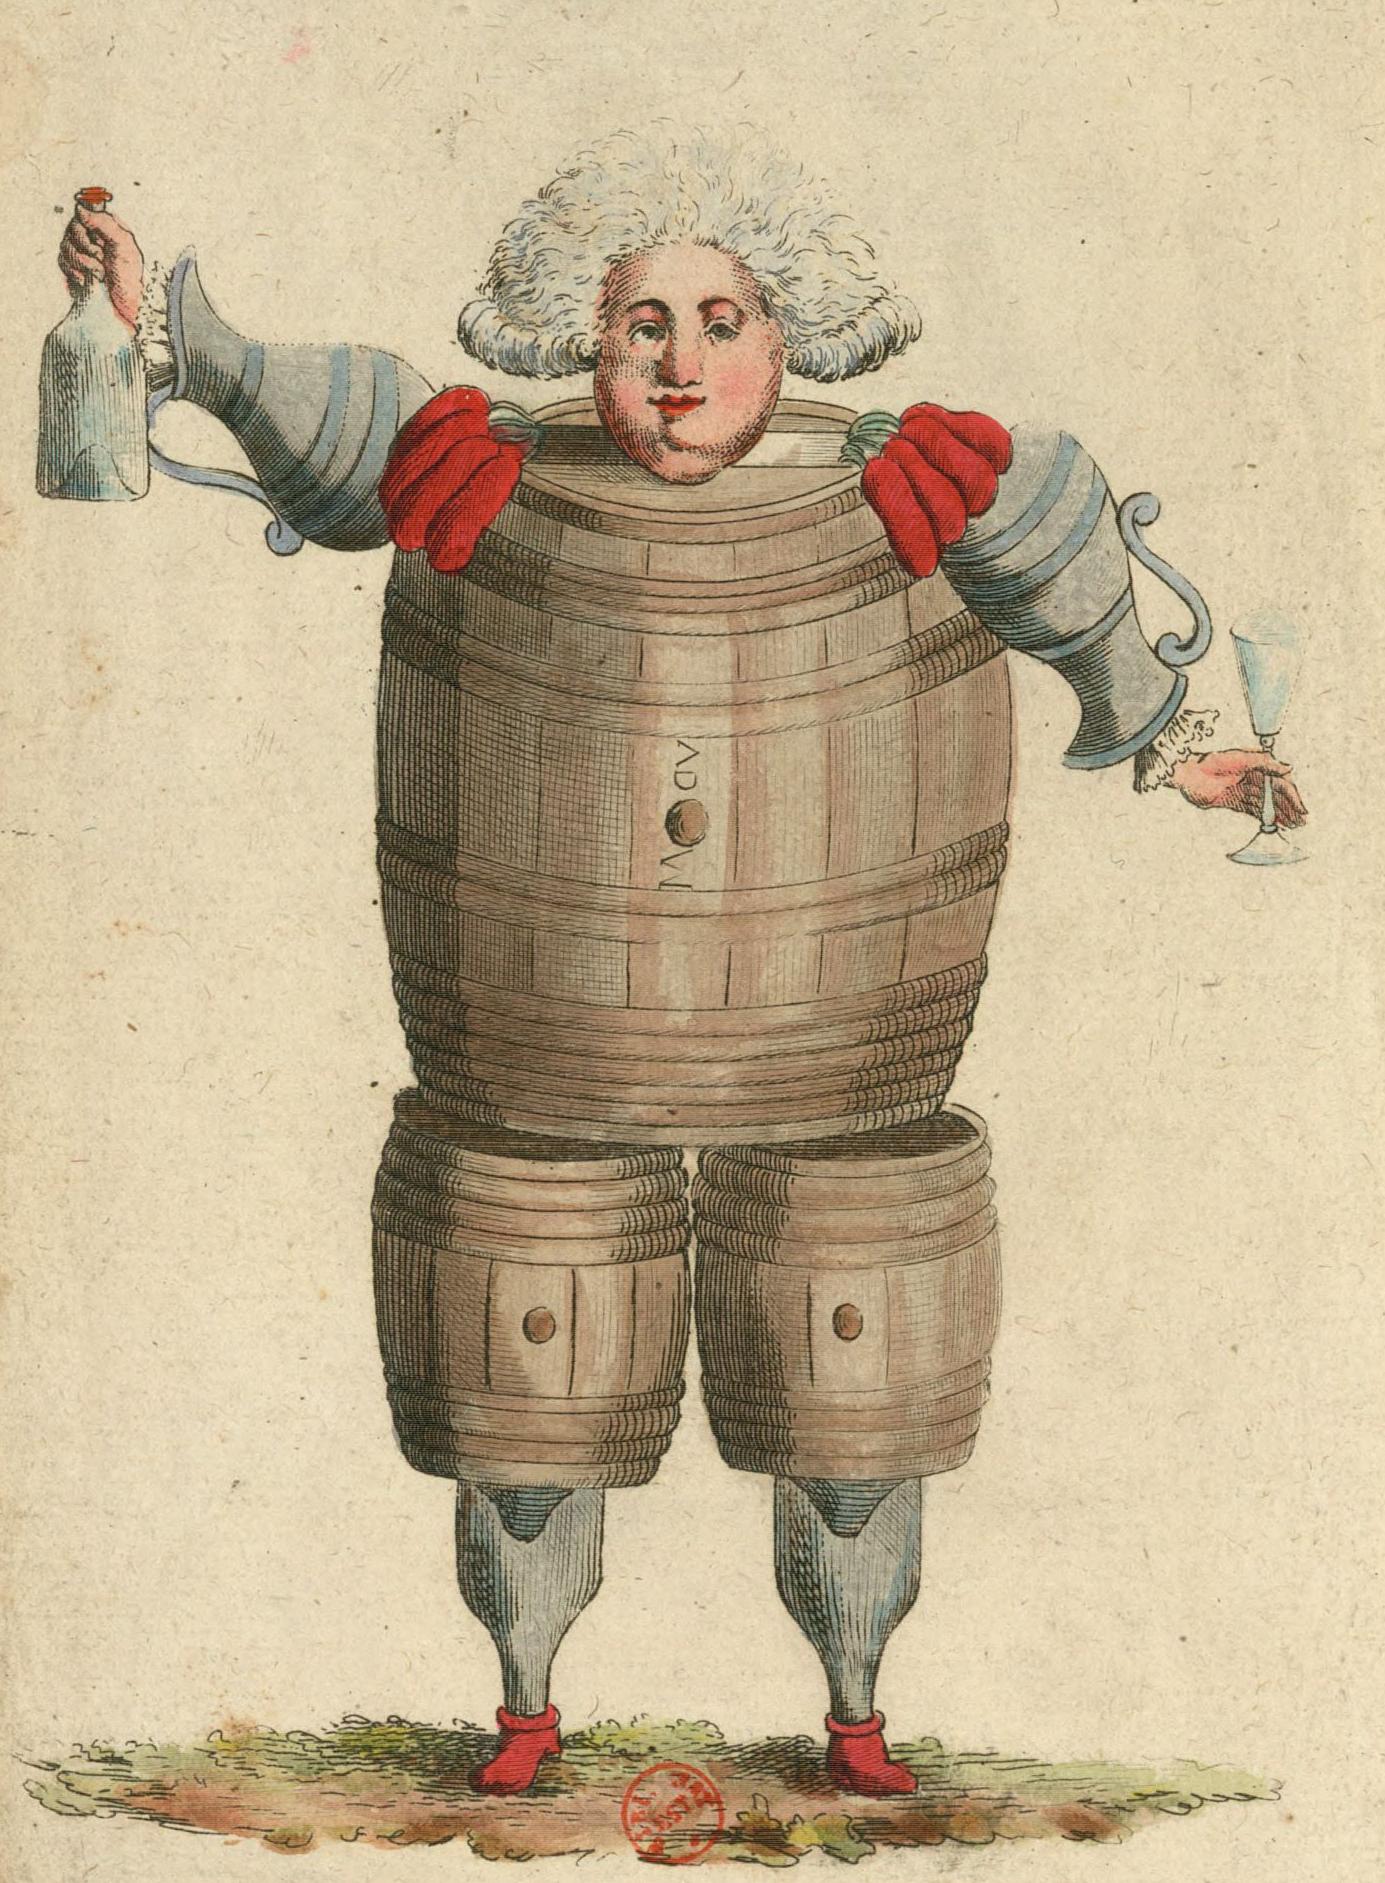 https://upload.wikimedia.org/wikipedia/commons/4/4f/Mirabeau-Tonneau.jpg